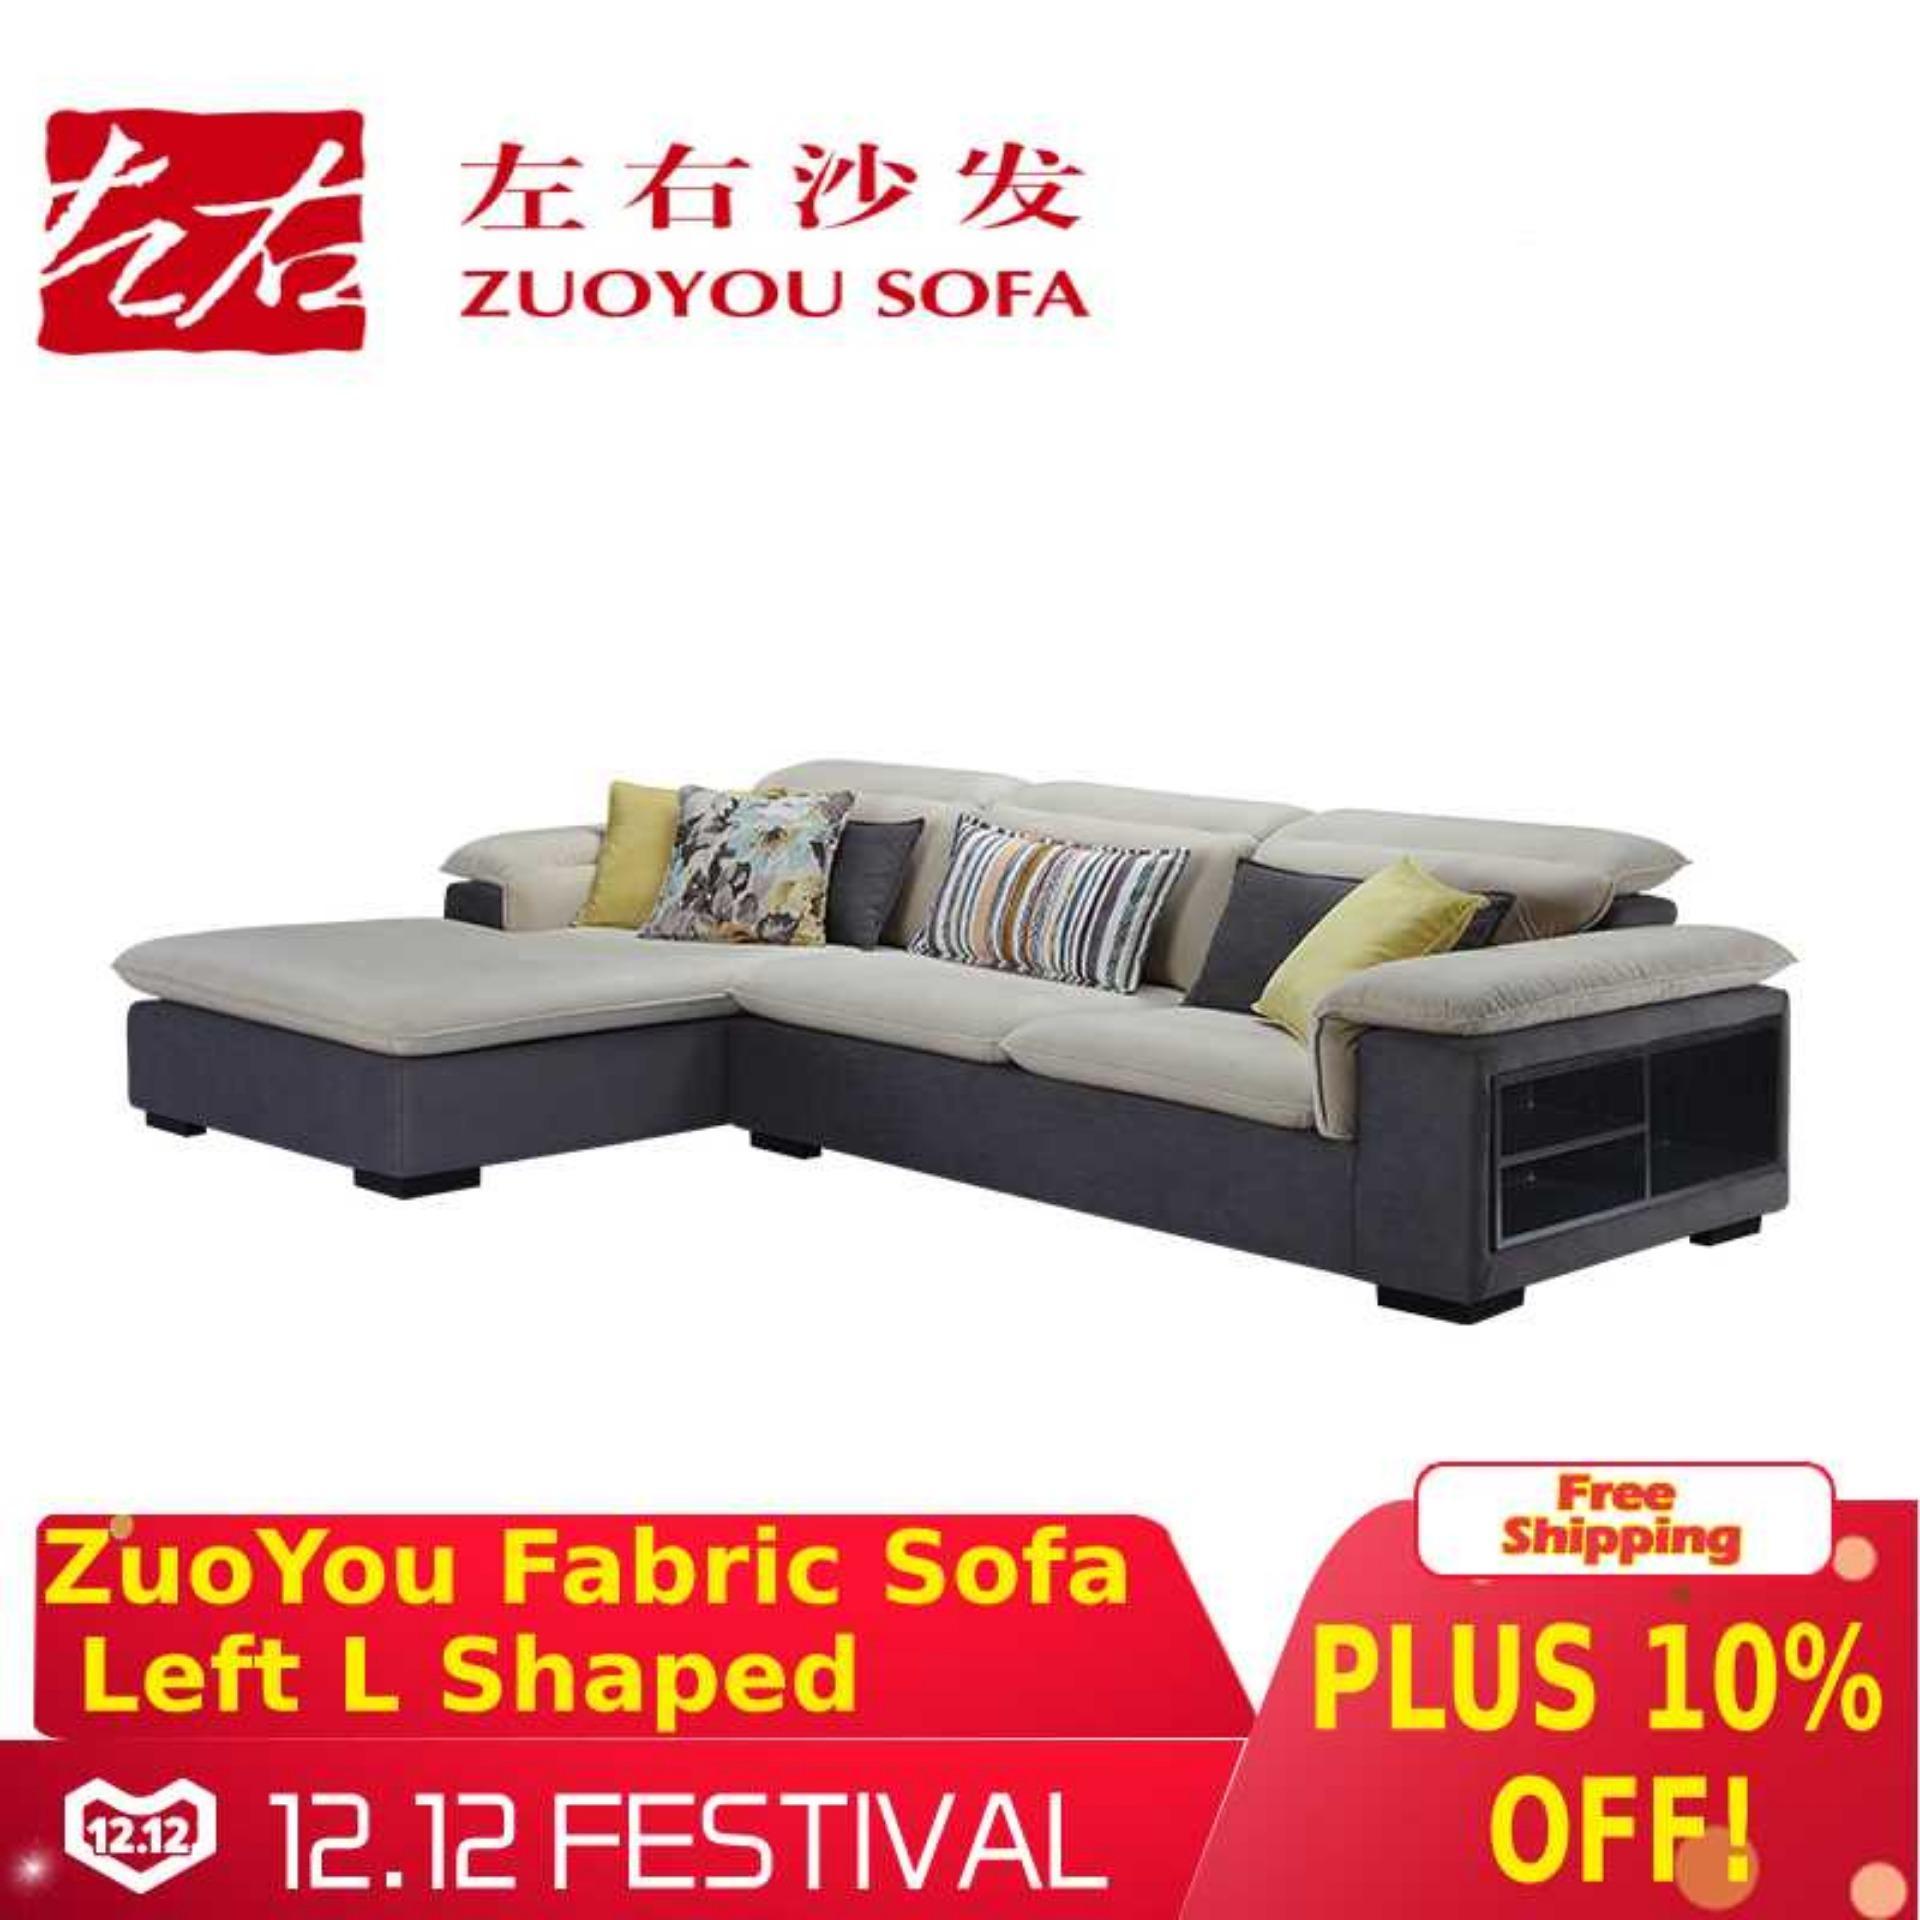 ZuoYou Fabric Sofa - Left L Shaped